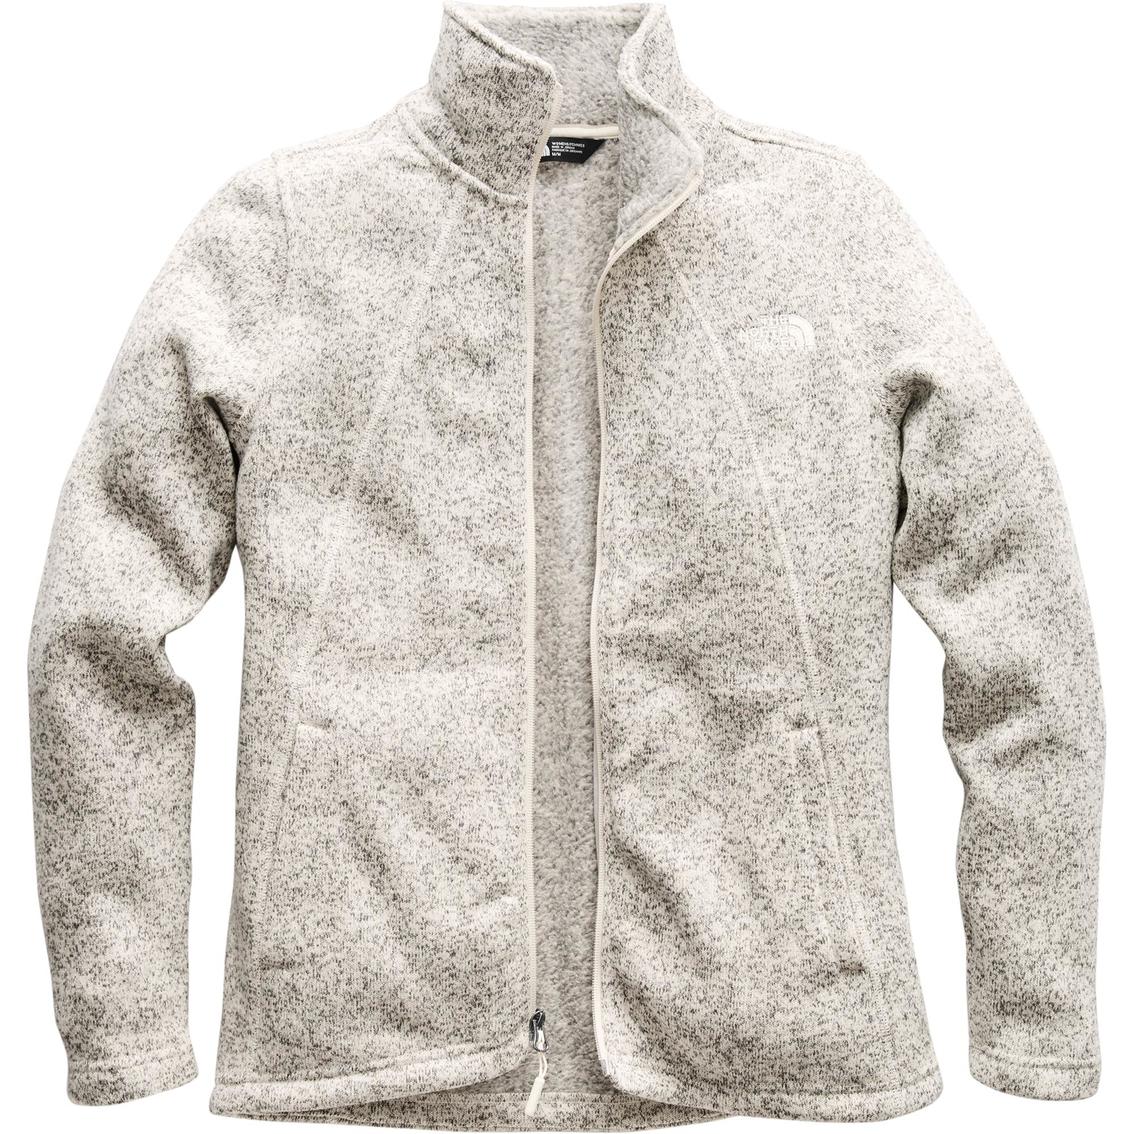 aa8b0ef1b The North Face Crescent Full Zip Jacket | Jackets | Apparel | Shop ...